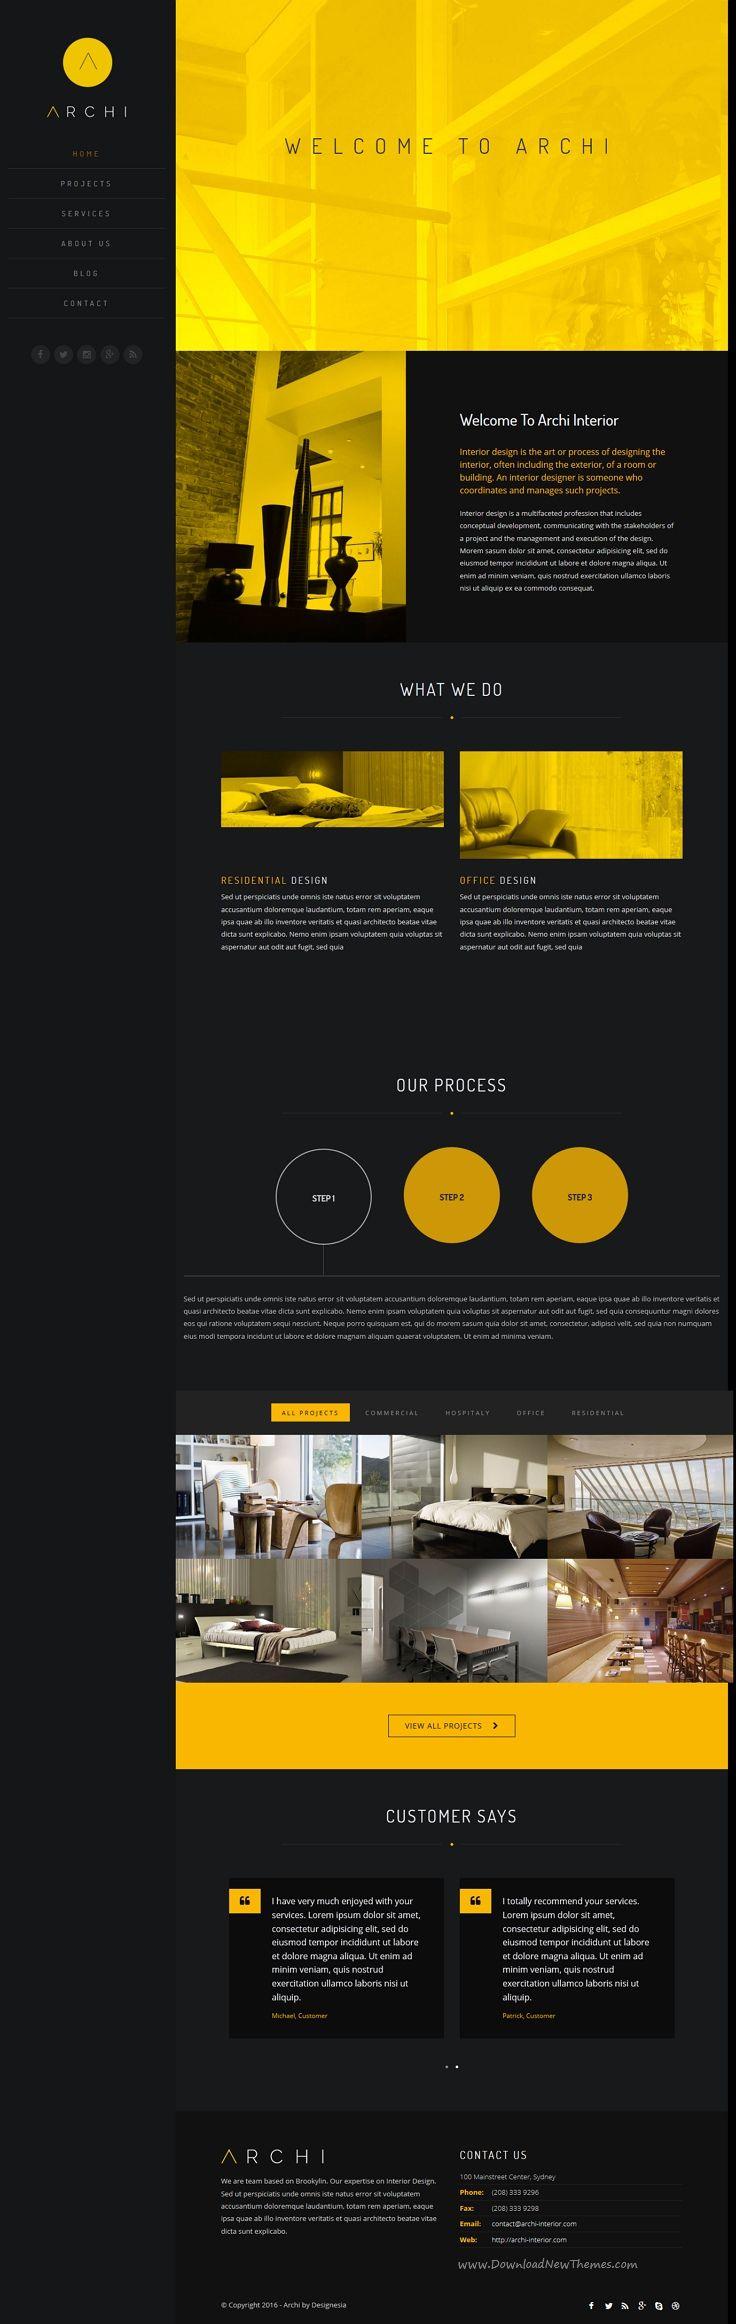 25 best ideas about interior design portfolios on pinterest interior design resume design for Interior design portfolio websites